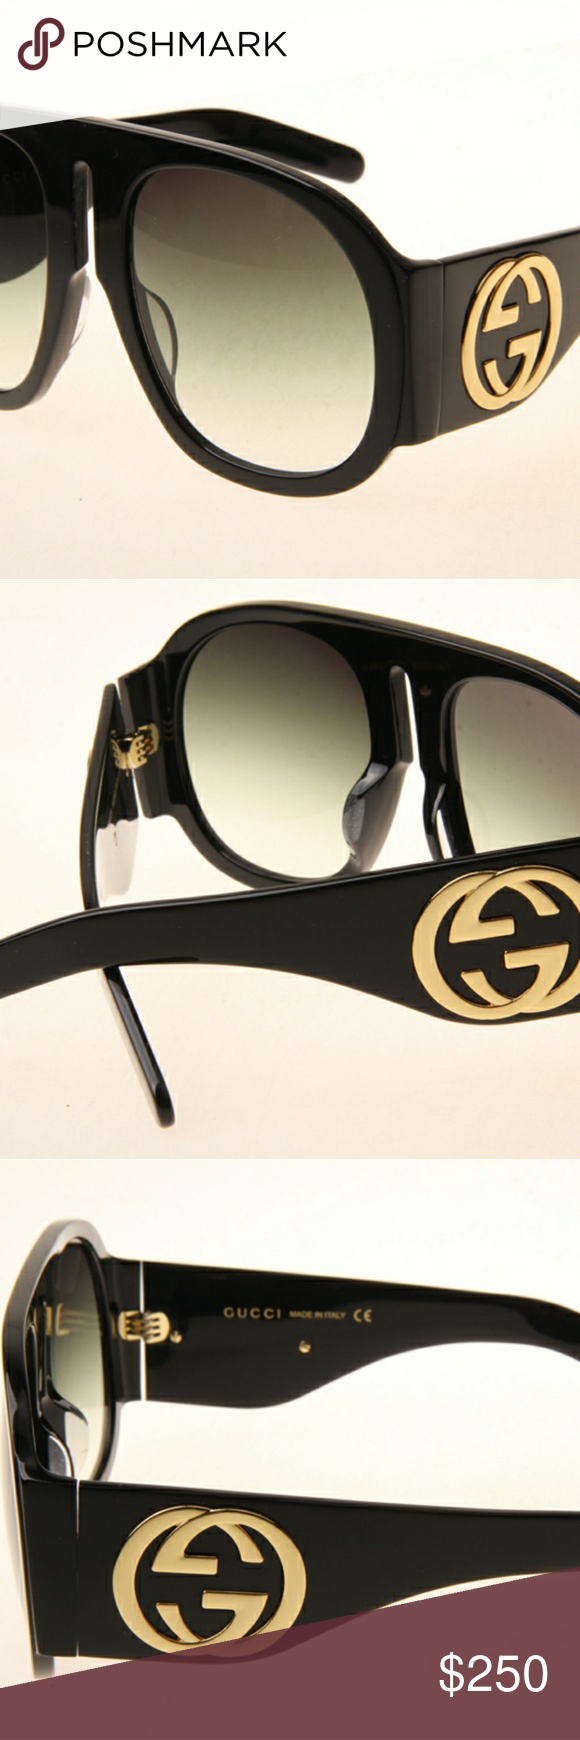 Gucci GG0152S Sunglasses SKU: GG0152S Brand new Never worn Frame ...